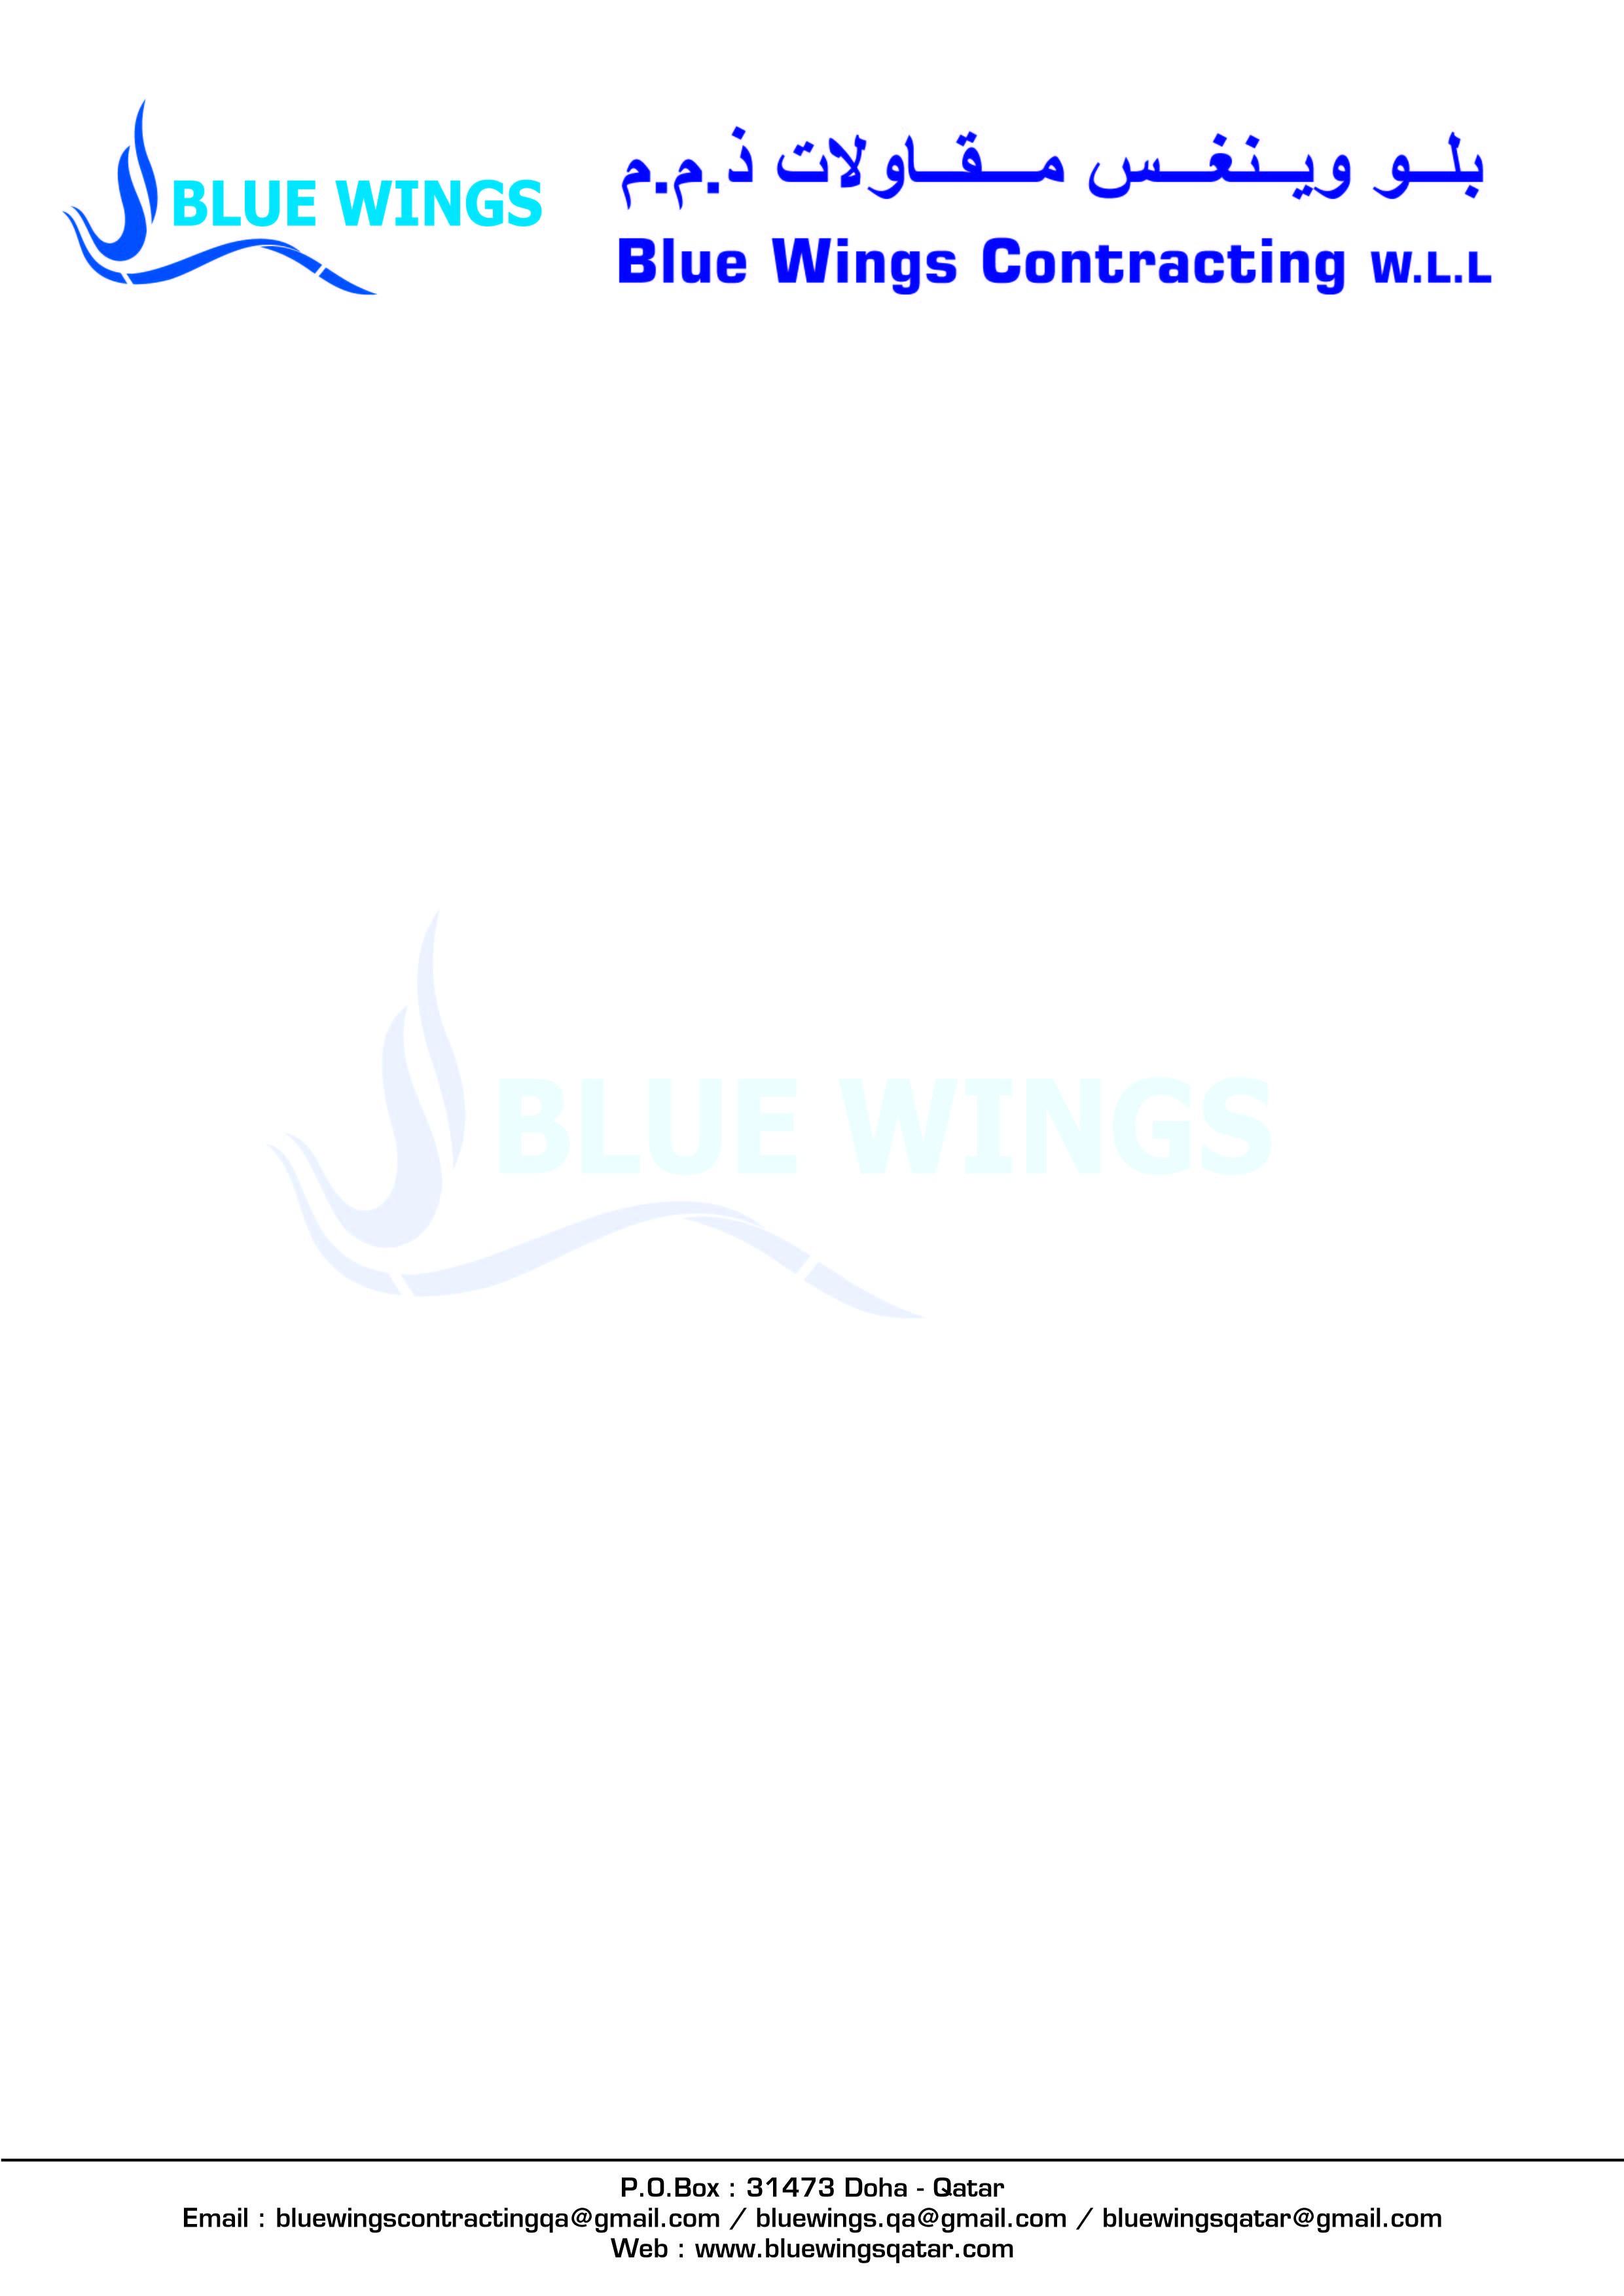 Blue Wings Contracting W L L | LinkedIn